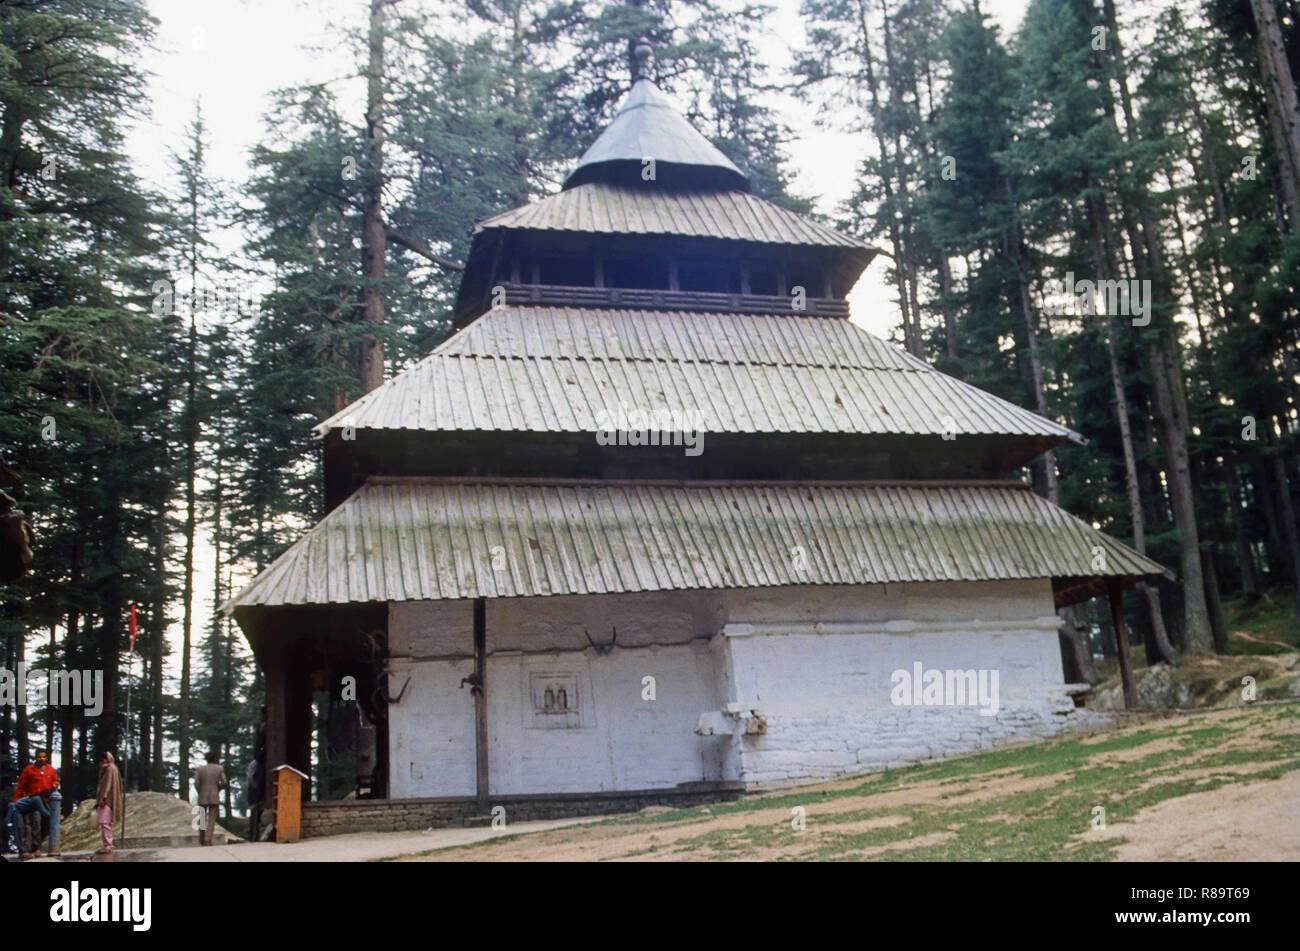 Hadimbadevi Temple, Manali, Himachal Pradesh, India - Stock Image